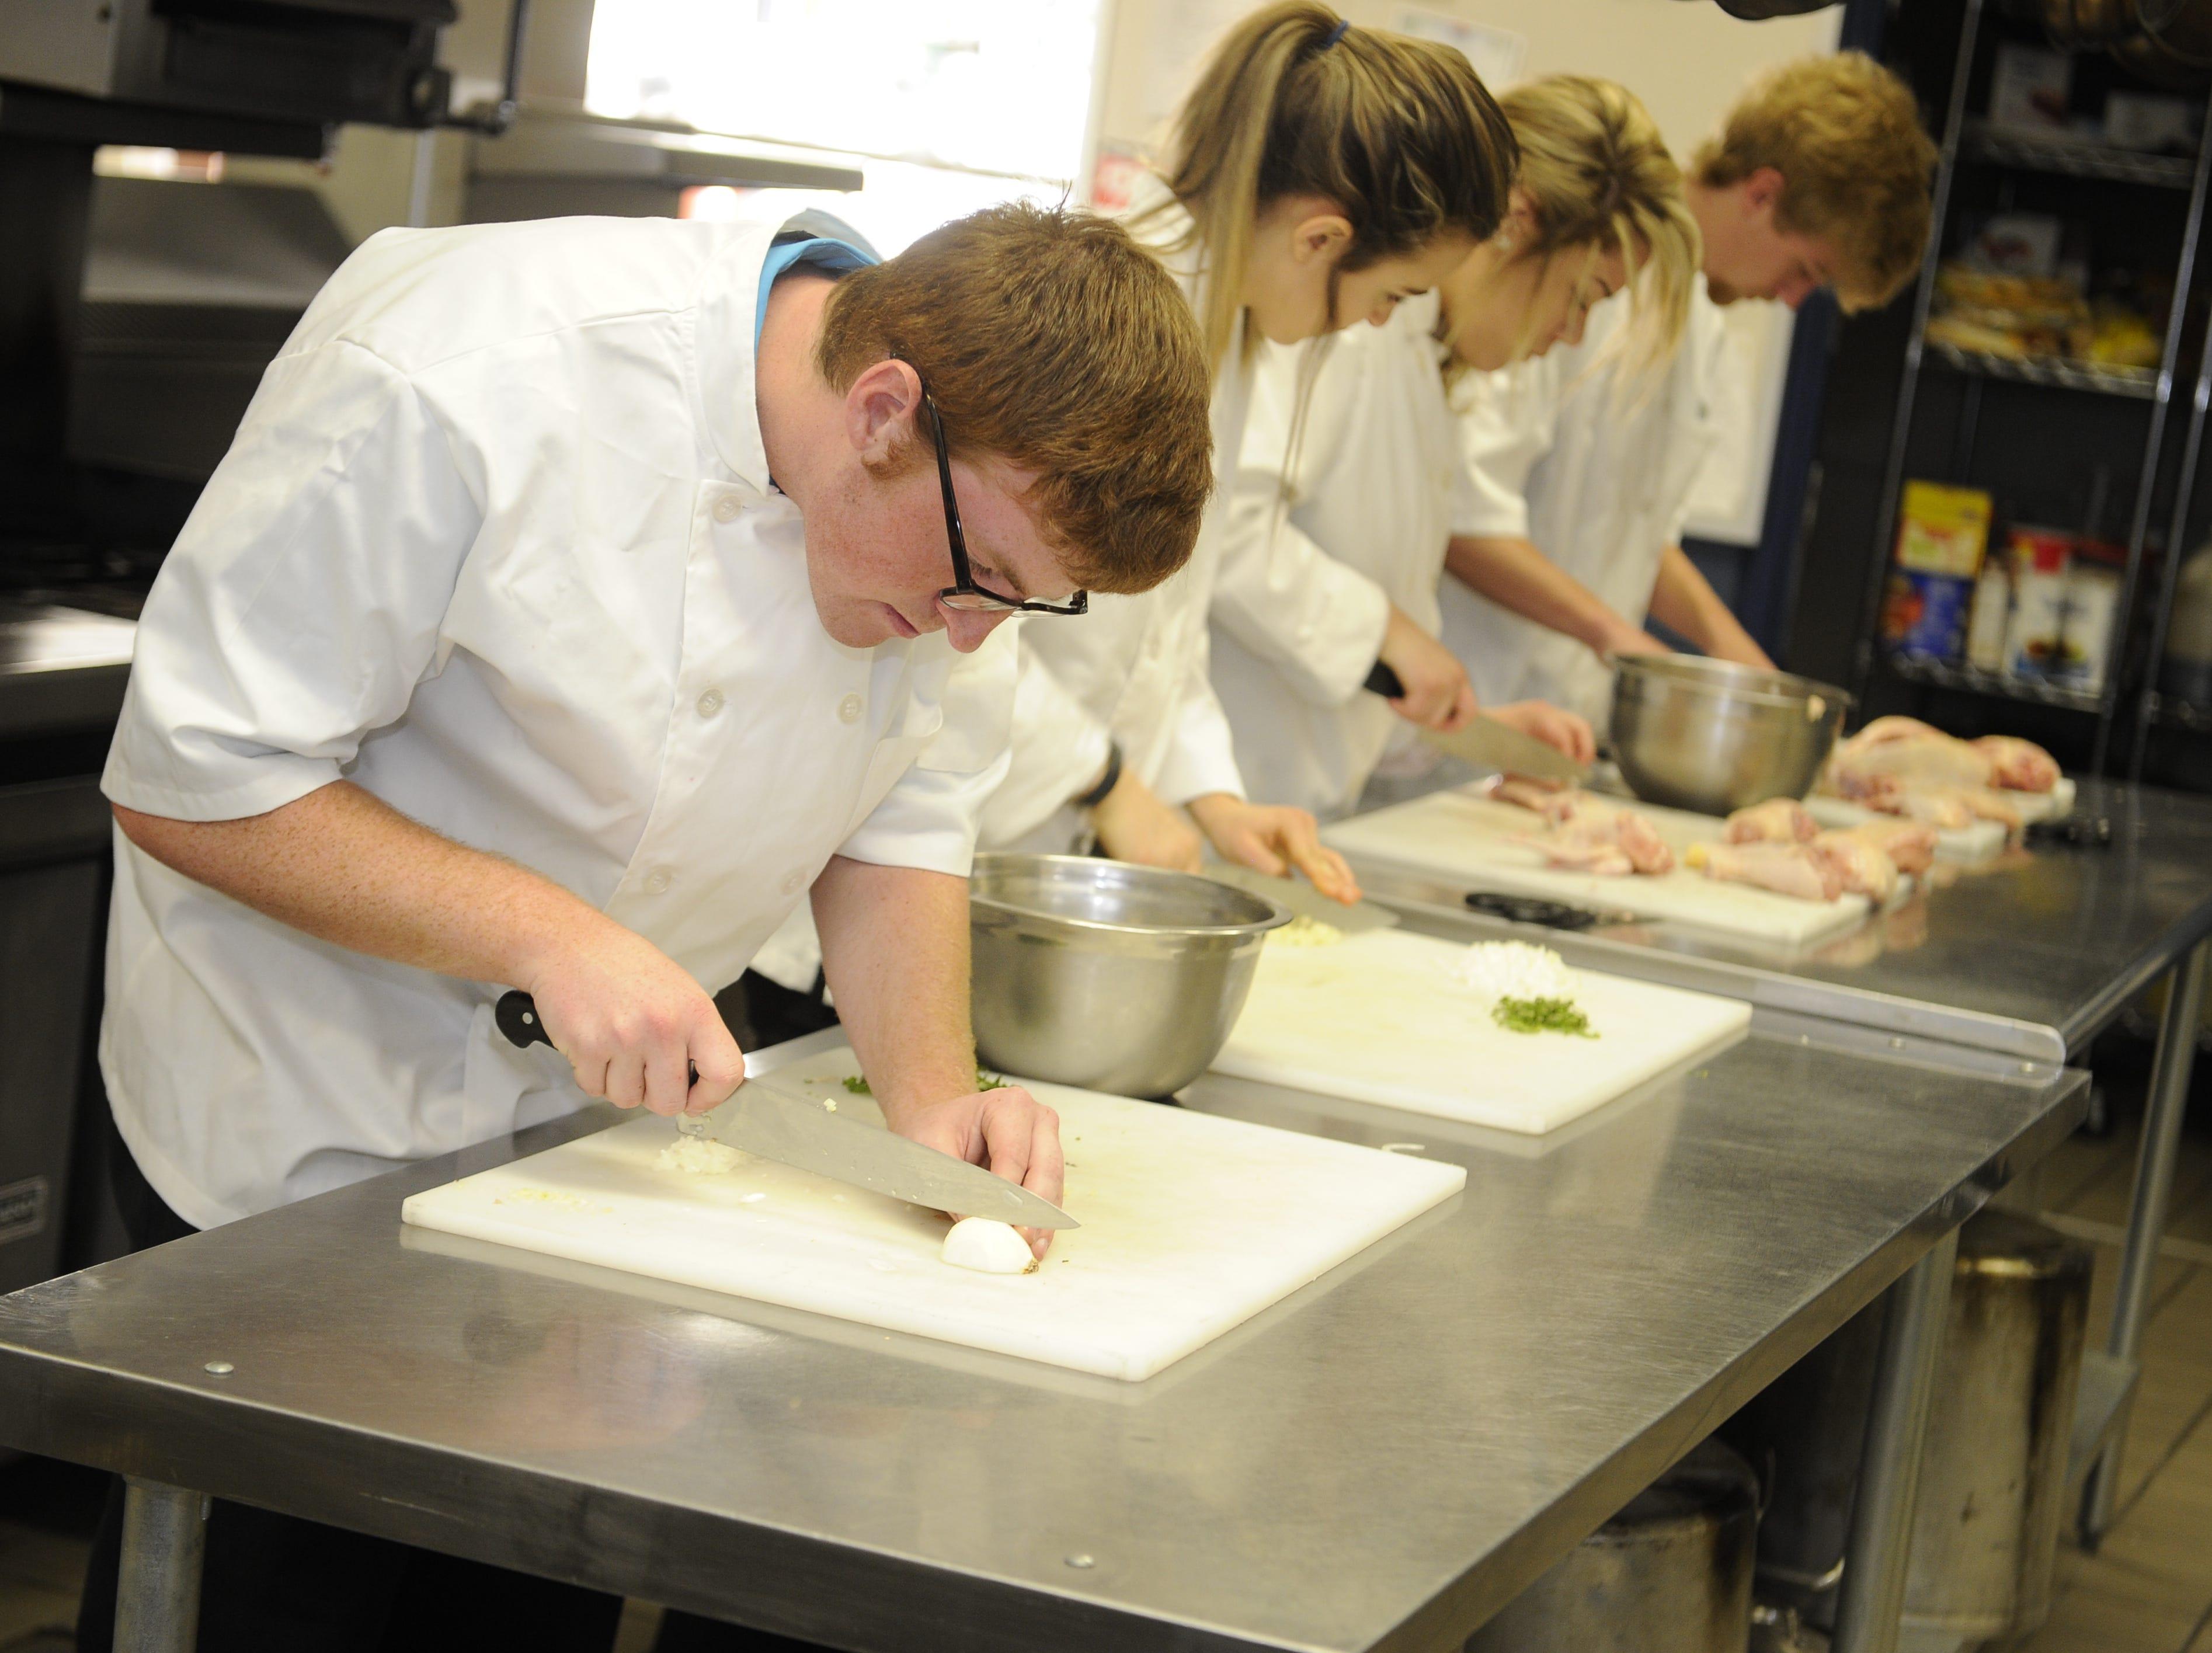 Blackman High School offers culinary arts studies.